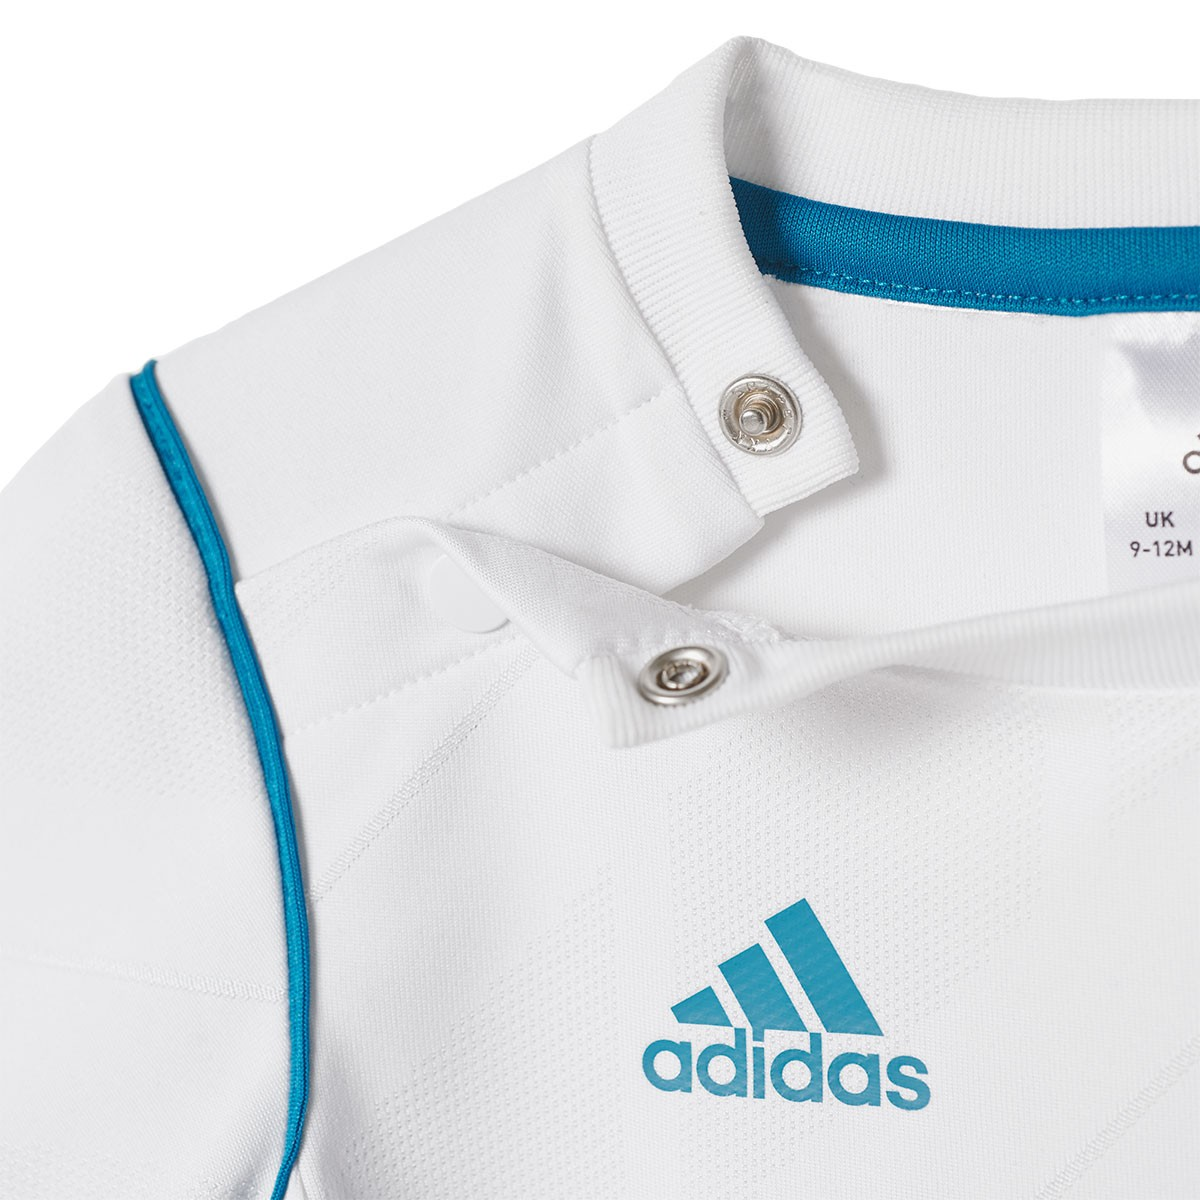 a8e032934c3 Kit adidas Infants Real Madrid Home 2017-2018 White-Vivid teal - Football  store Fútbol Emotion